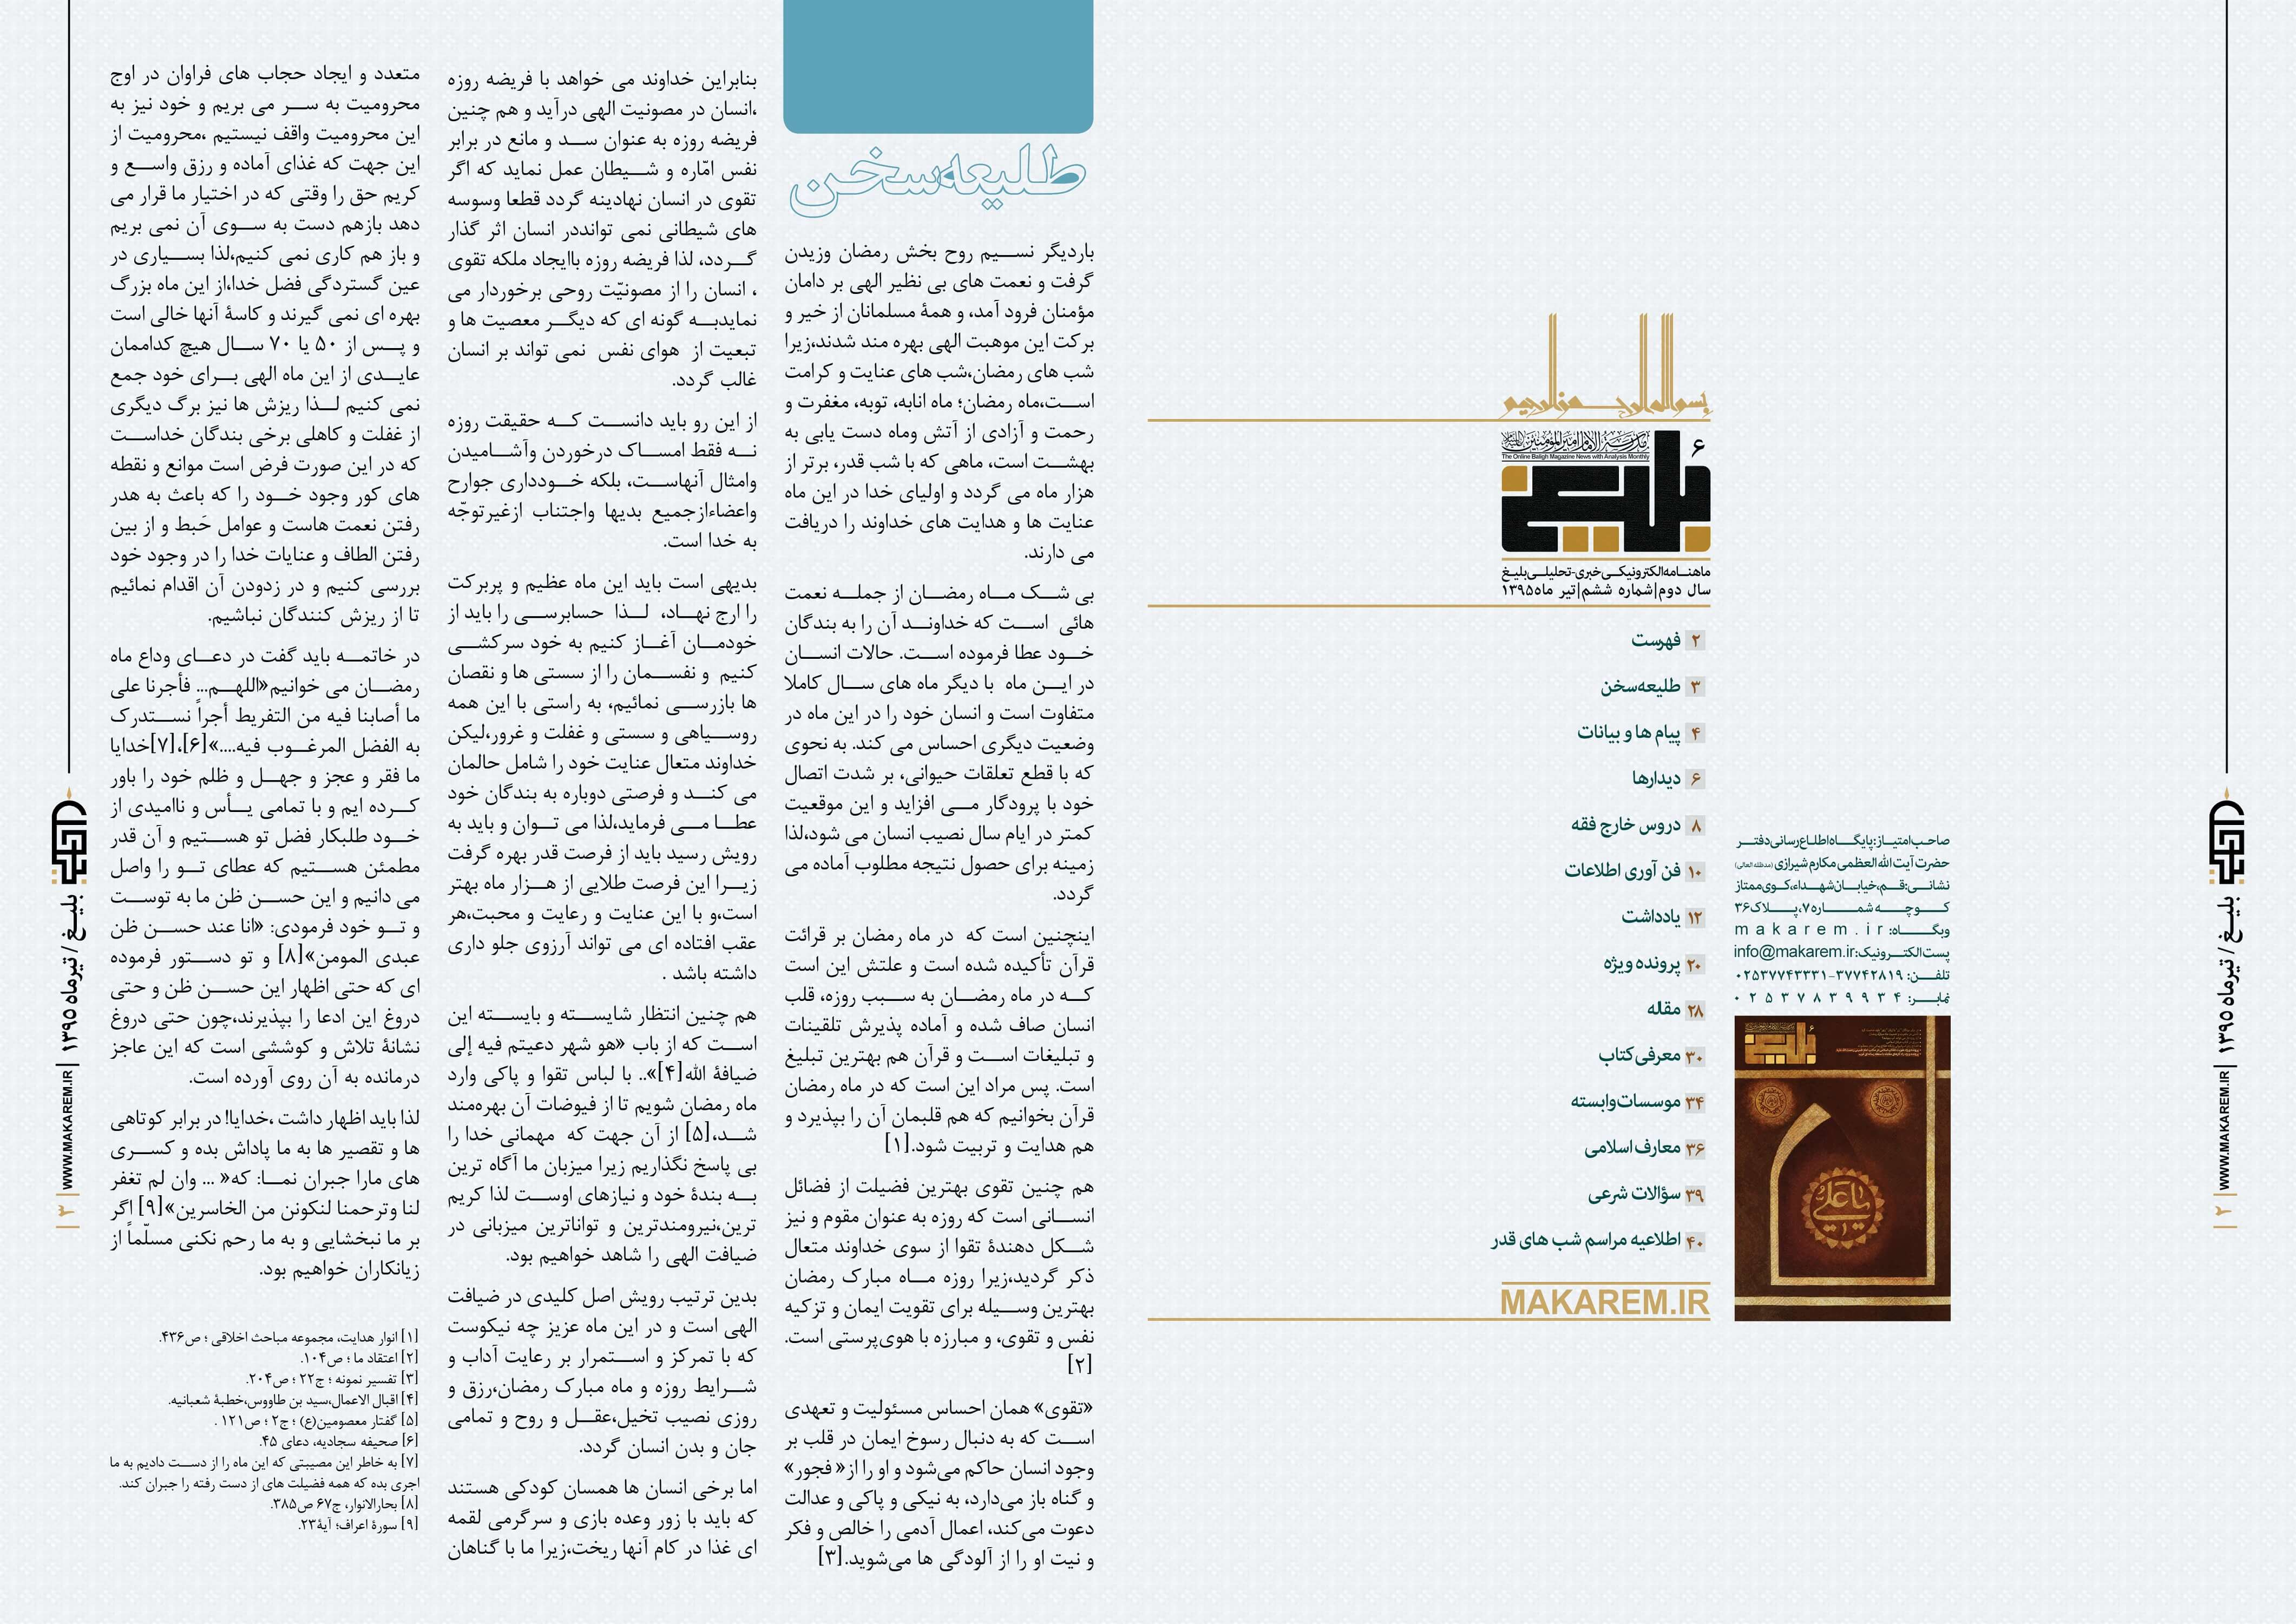 بلیغ 02-مدرسه الامام امیر المومنین (ع)